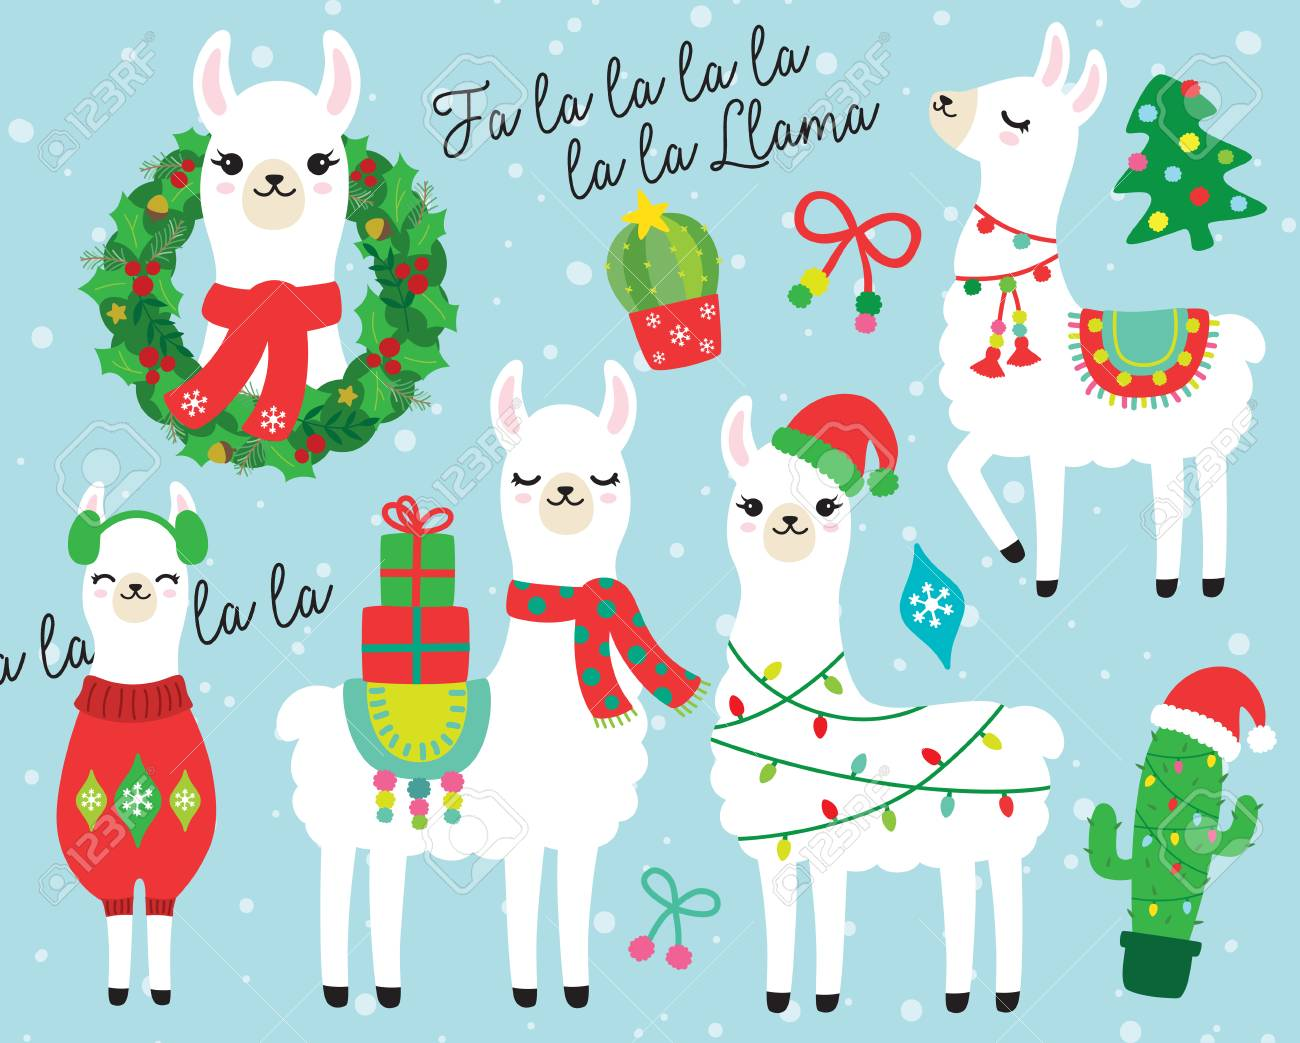 Llama Christmas.Cute Llama And Alpaca With Christmas Holidays Theme Vector Illustration